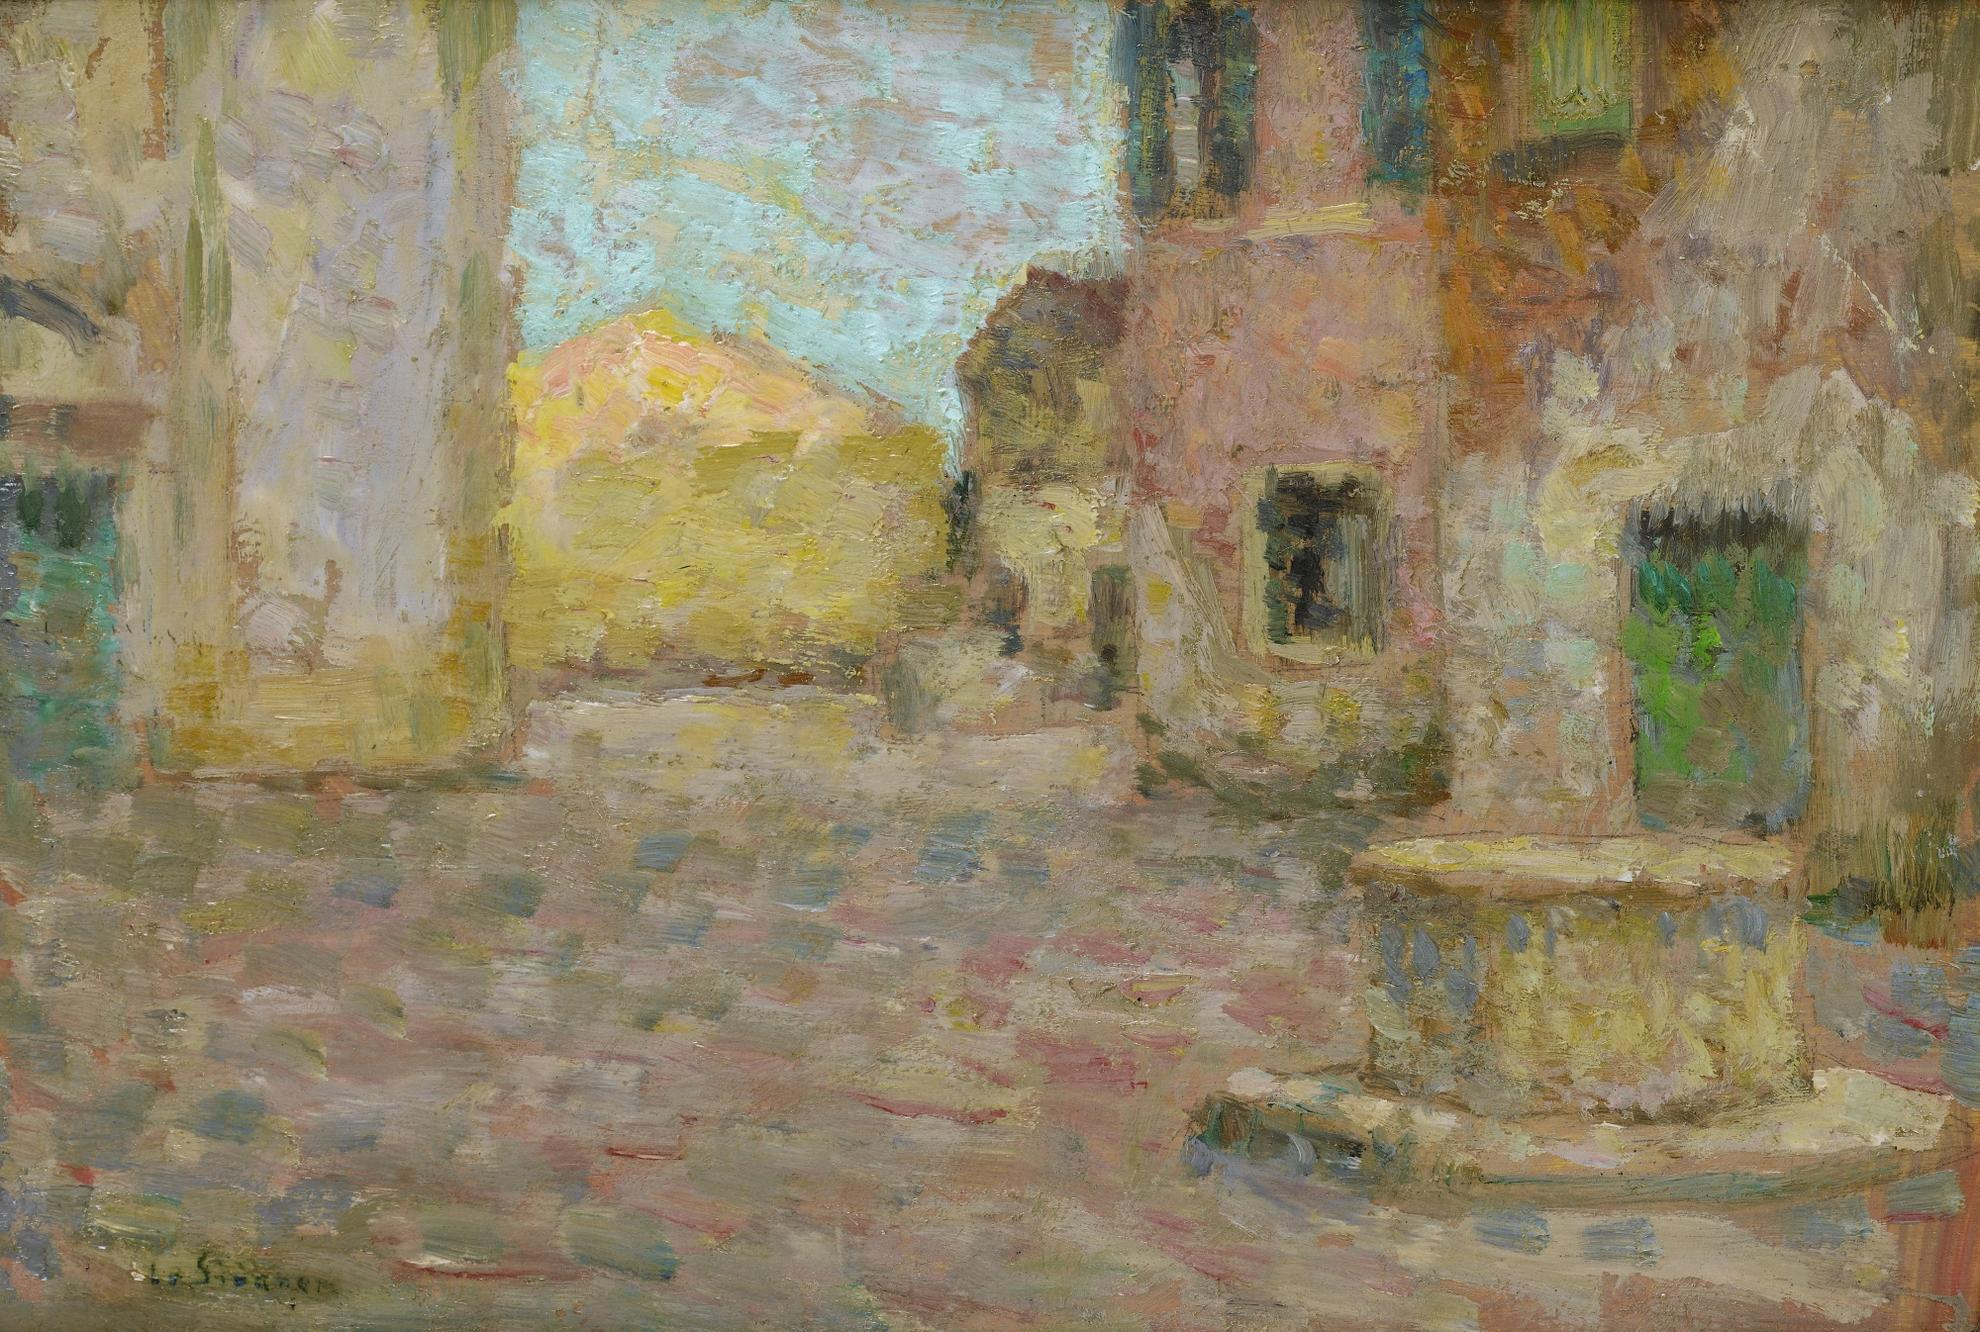 Henri Eugene Le Sidaner-Petite Place, Venise-1905